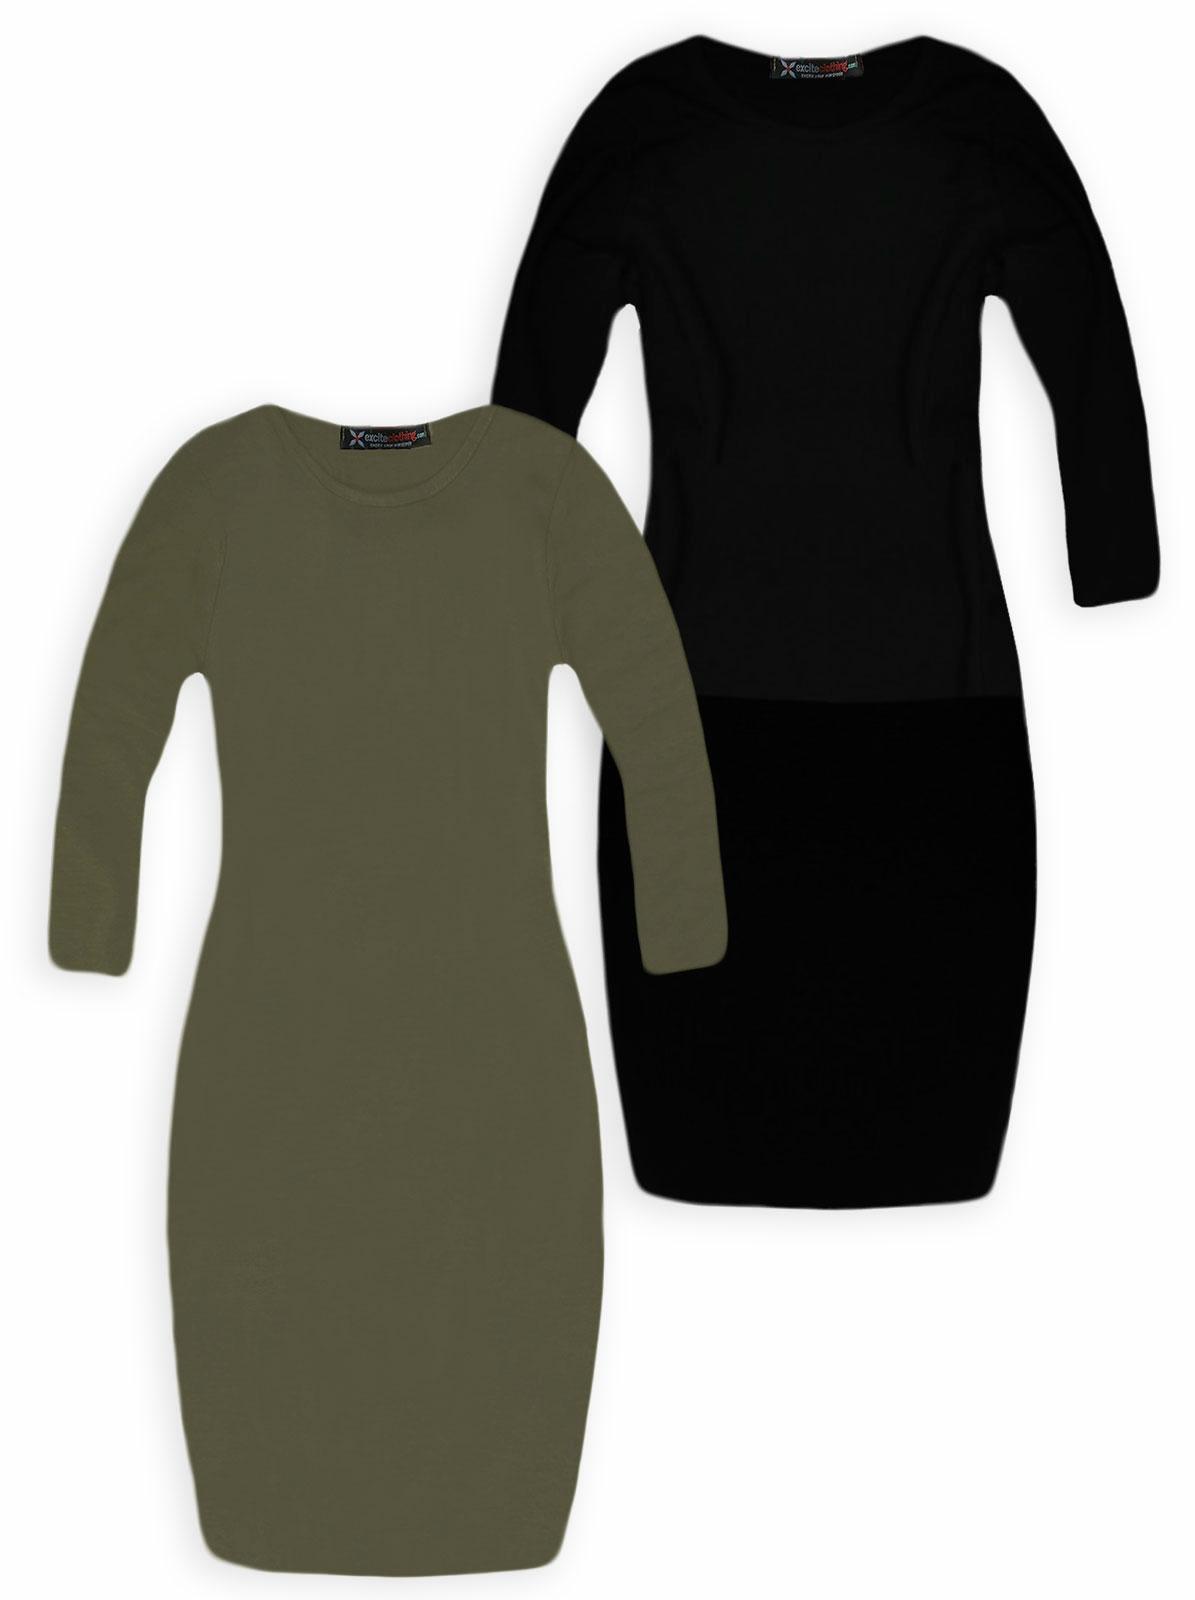 1ae04558ff96 Girls Midi Dress New Kids Long Sleeved Bodycon Dresses Black Khaki 5-13  Years